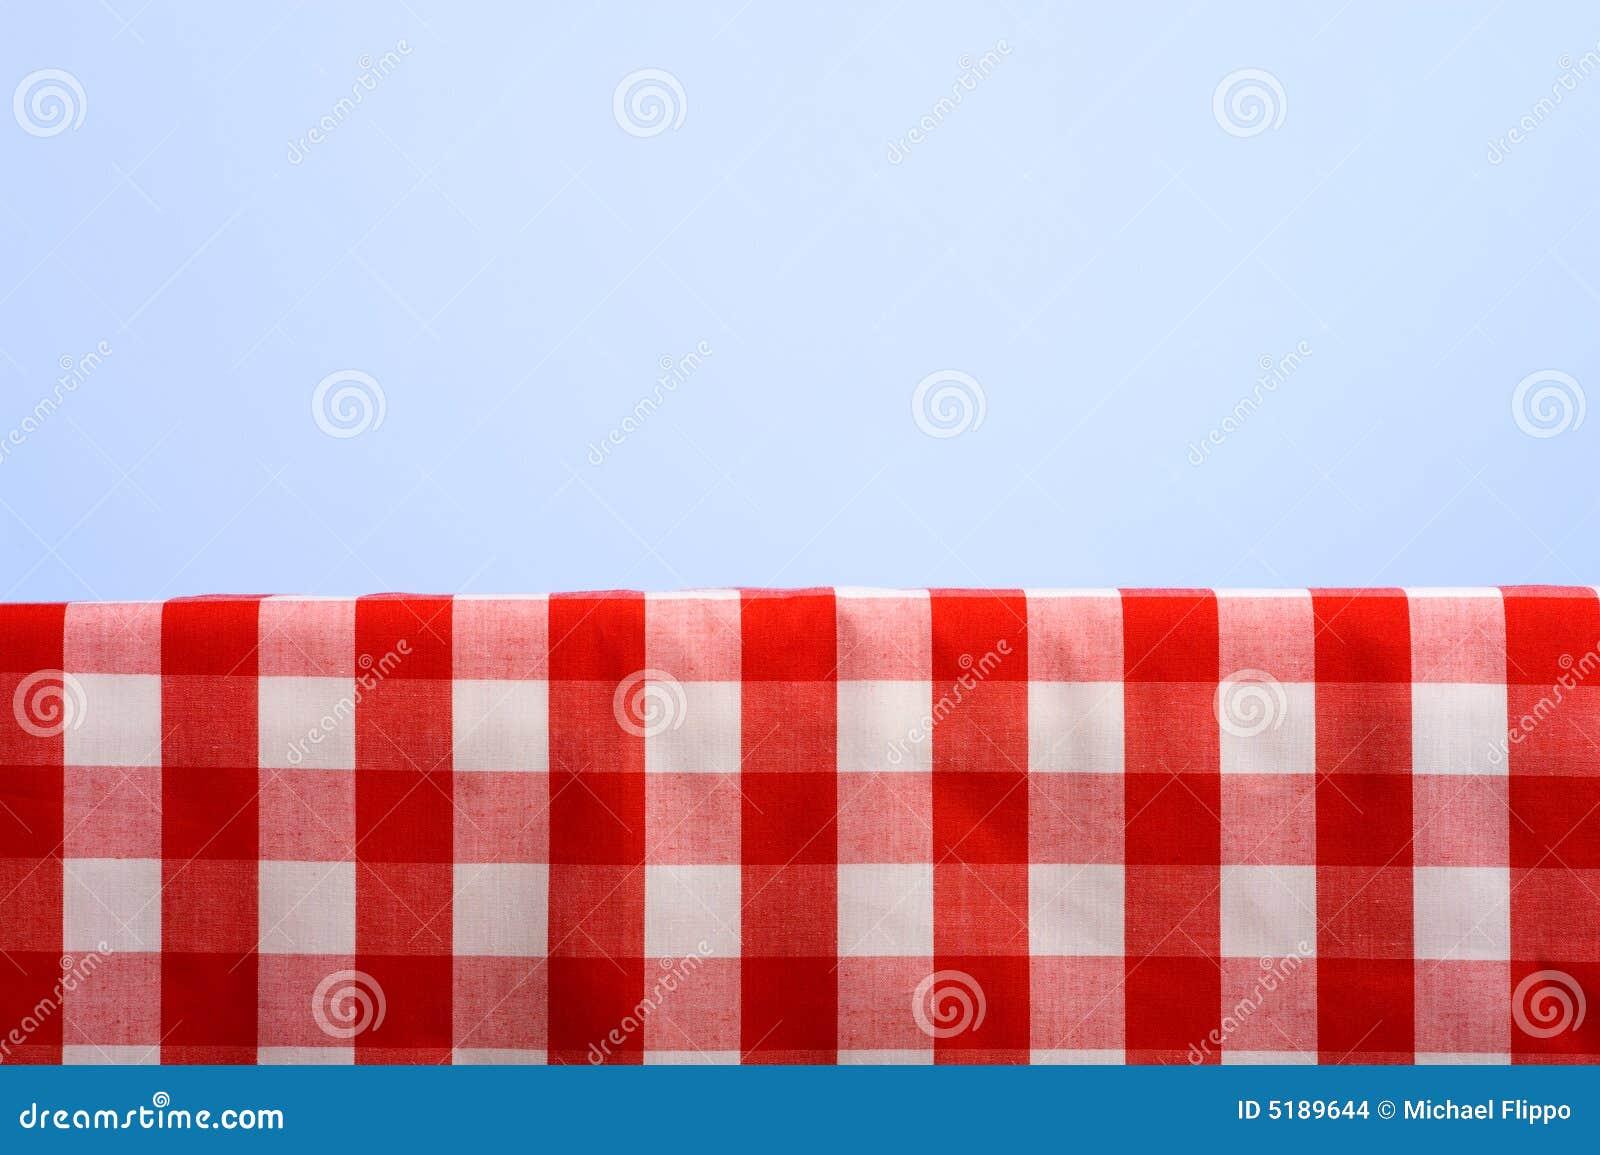 church picnic background - photo #17